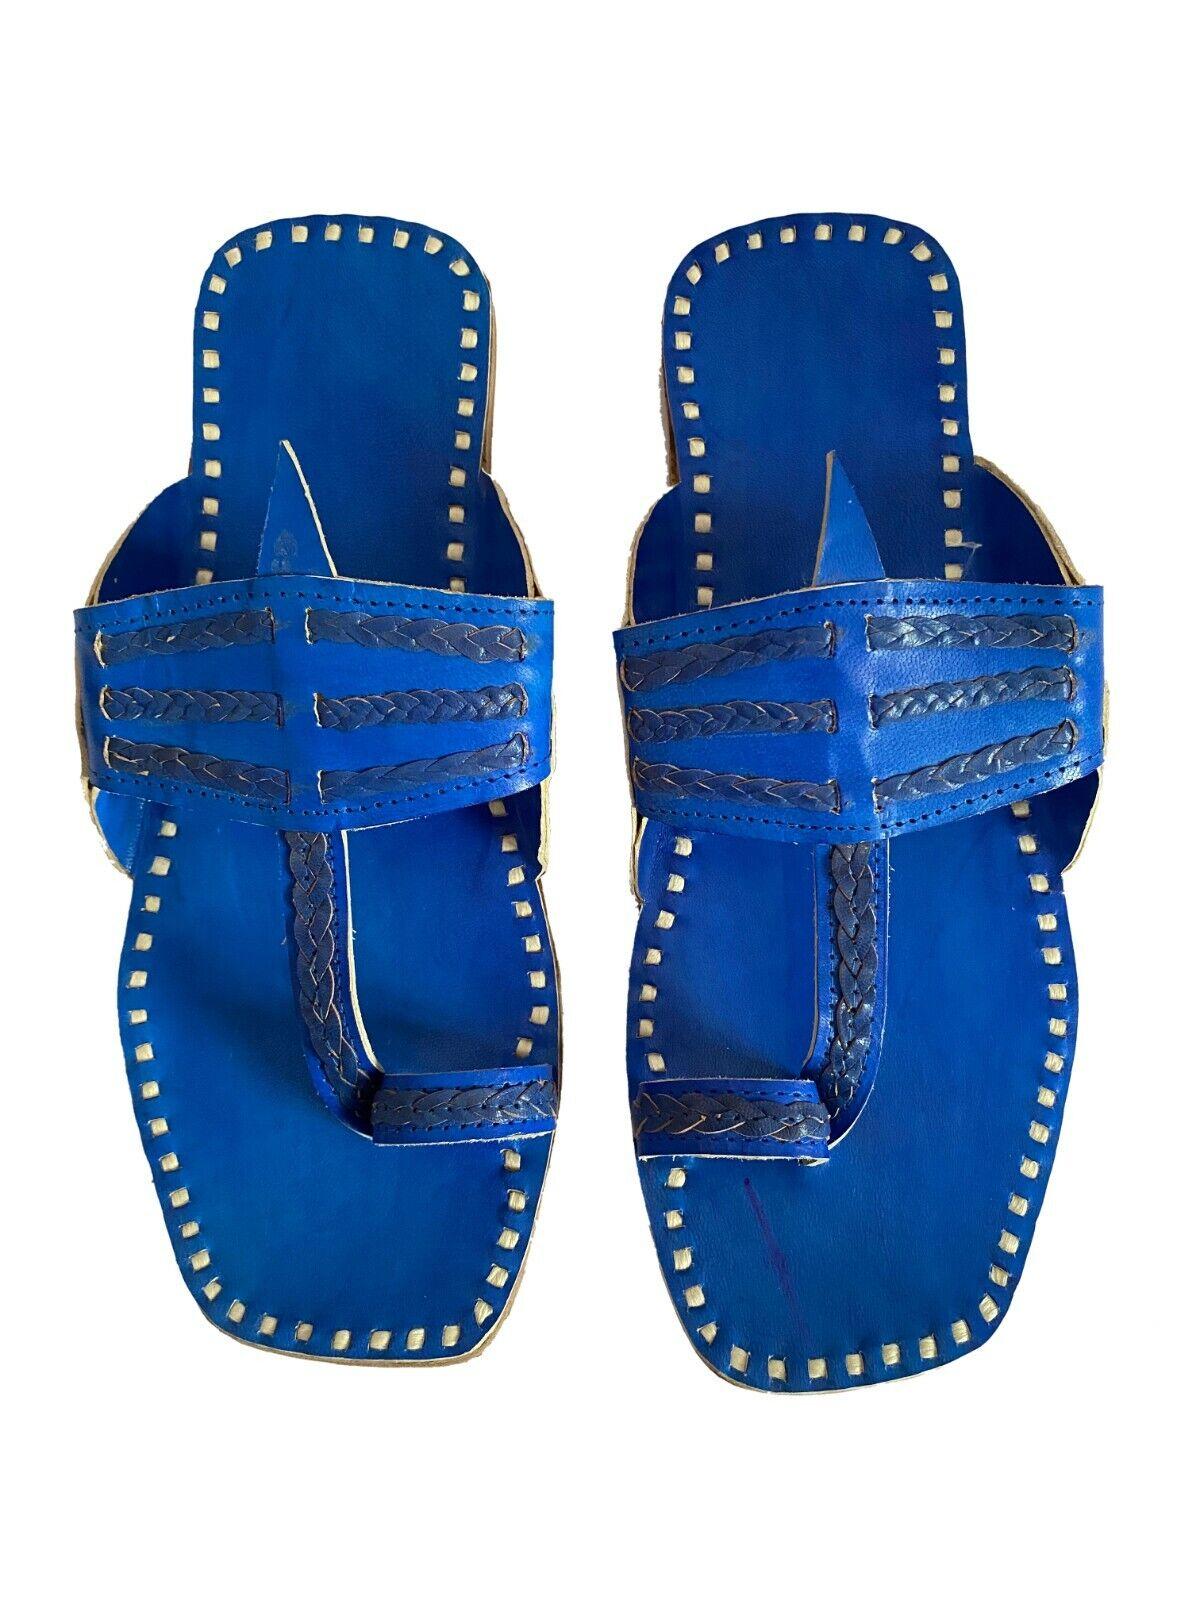 Mens Genuine blue leather sandals kolhapuri slippers flip flops handmade India